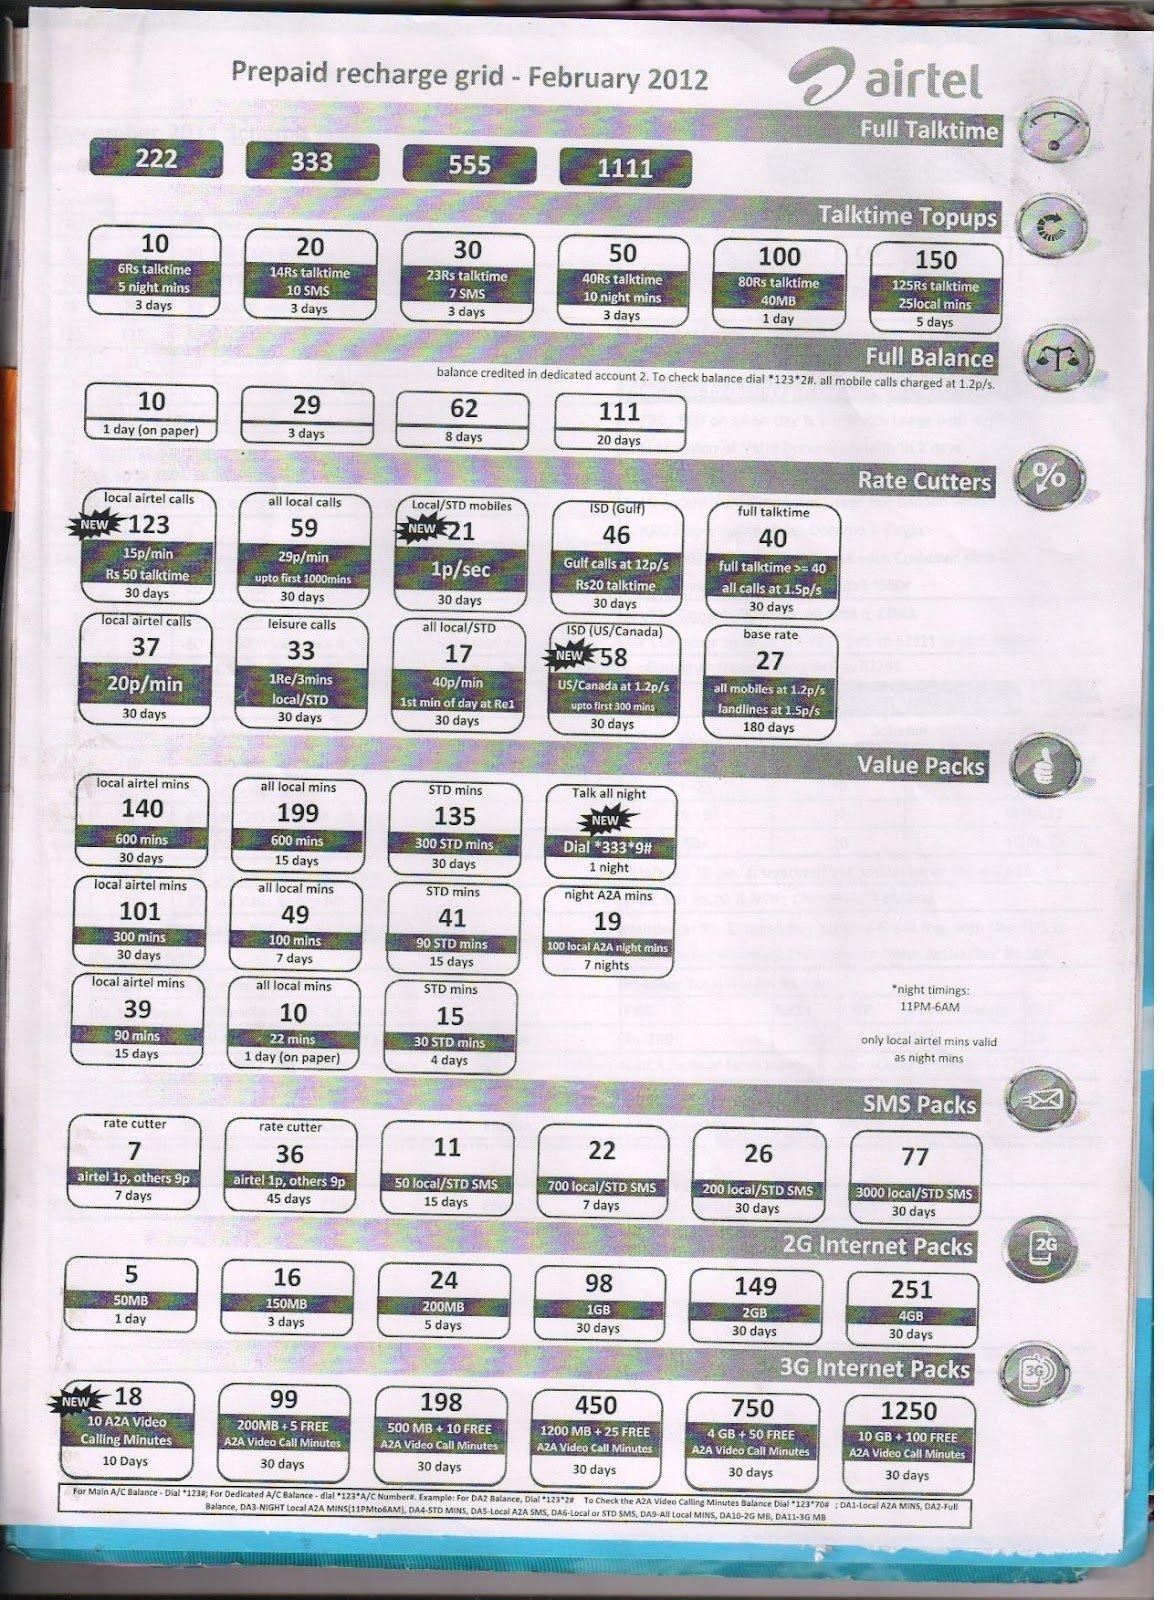 10 Stunning Idea Online Recharge Andhra Pradesh recharge tariff andhra pradesh india telicom 2012 world social news 2